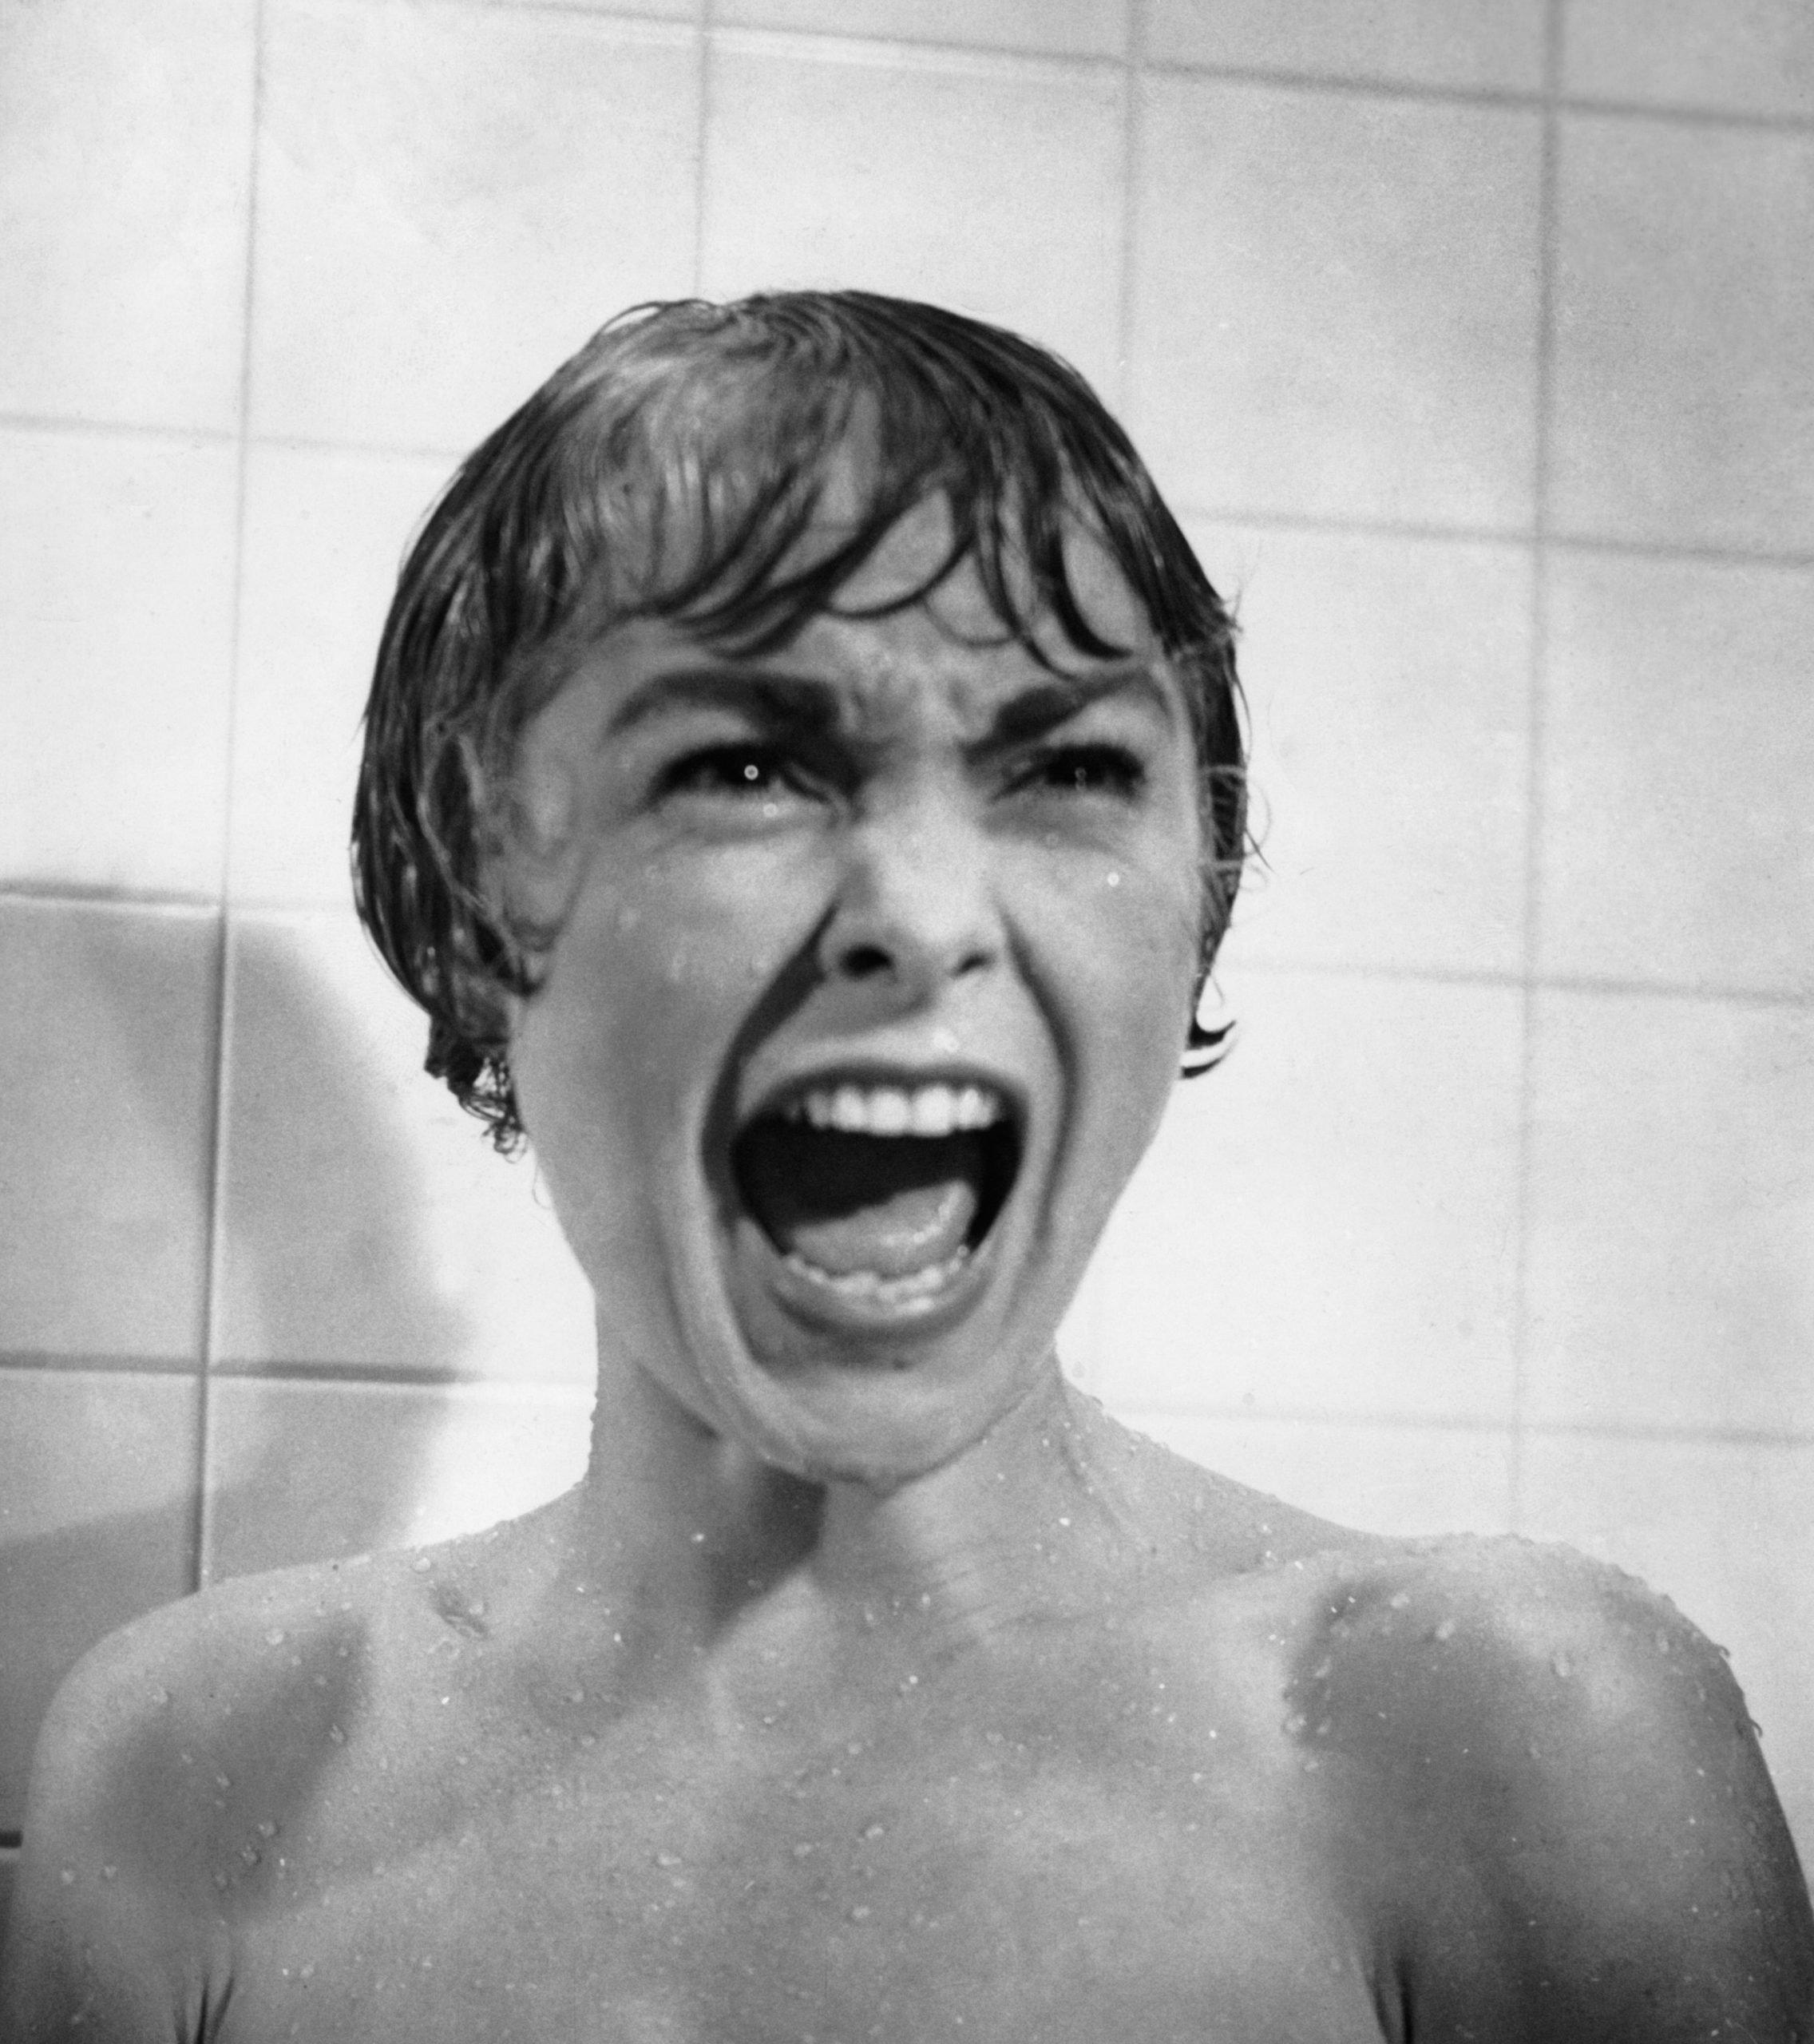 janet-leigh-psycho-shower-scene